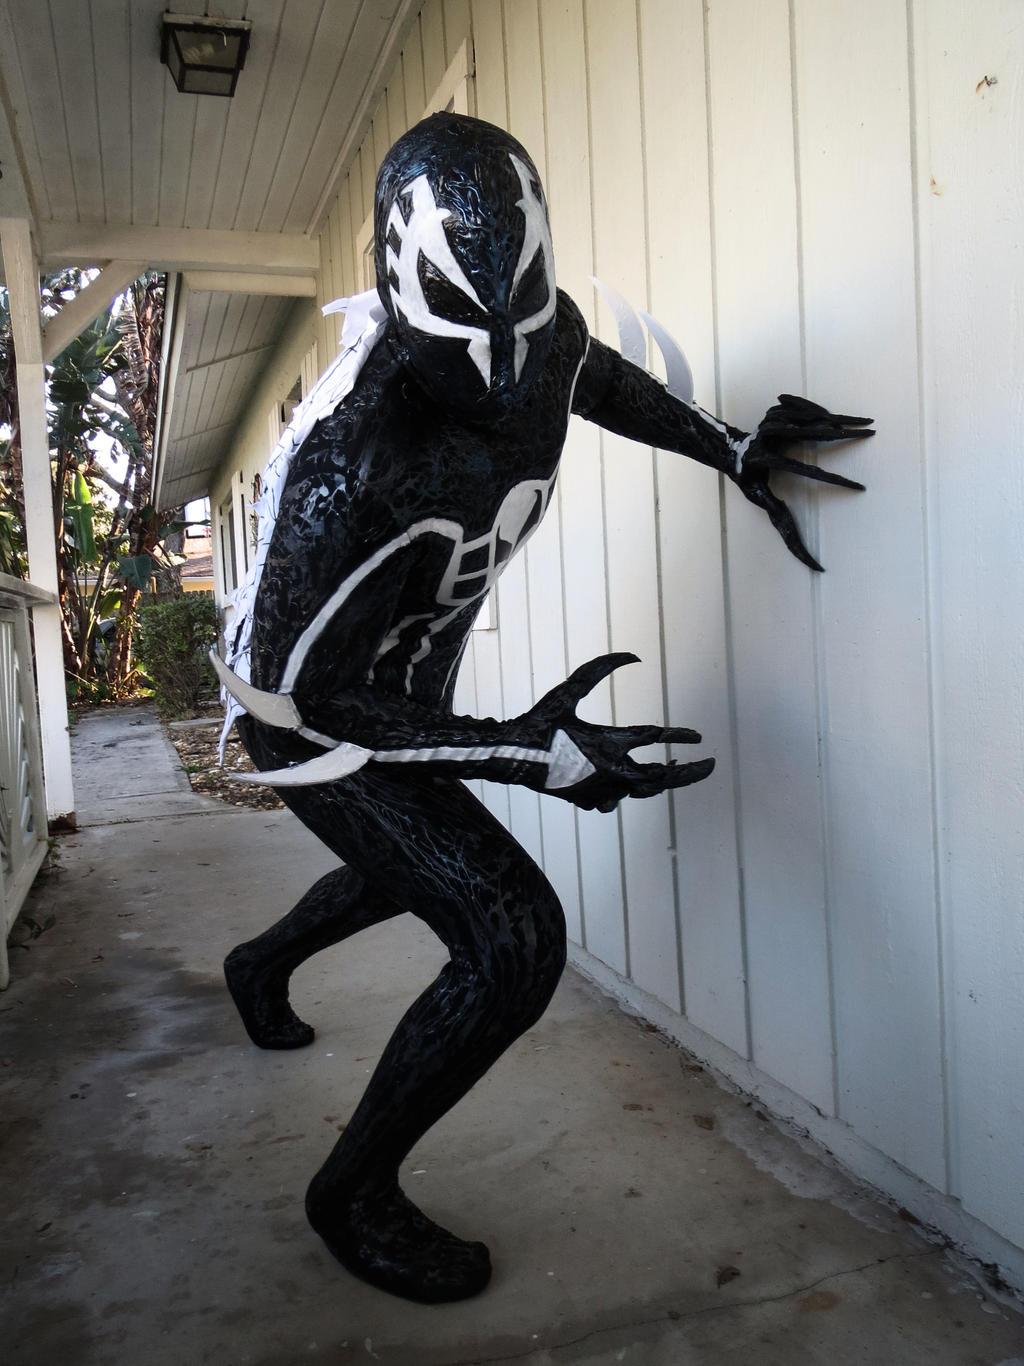 symbiote spiderman 2099 costume by symbiotex on deviantart